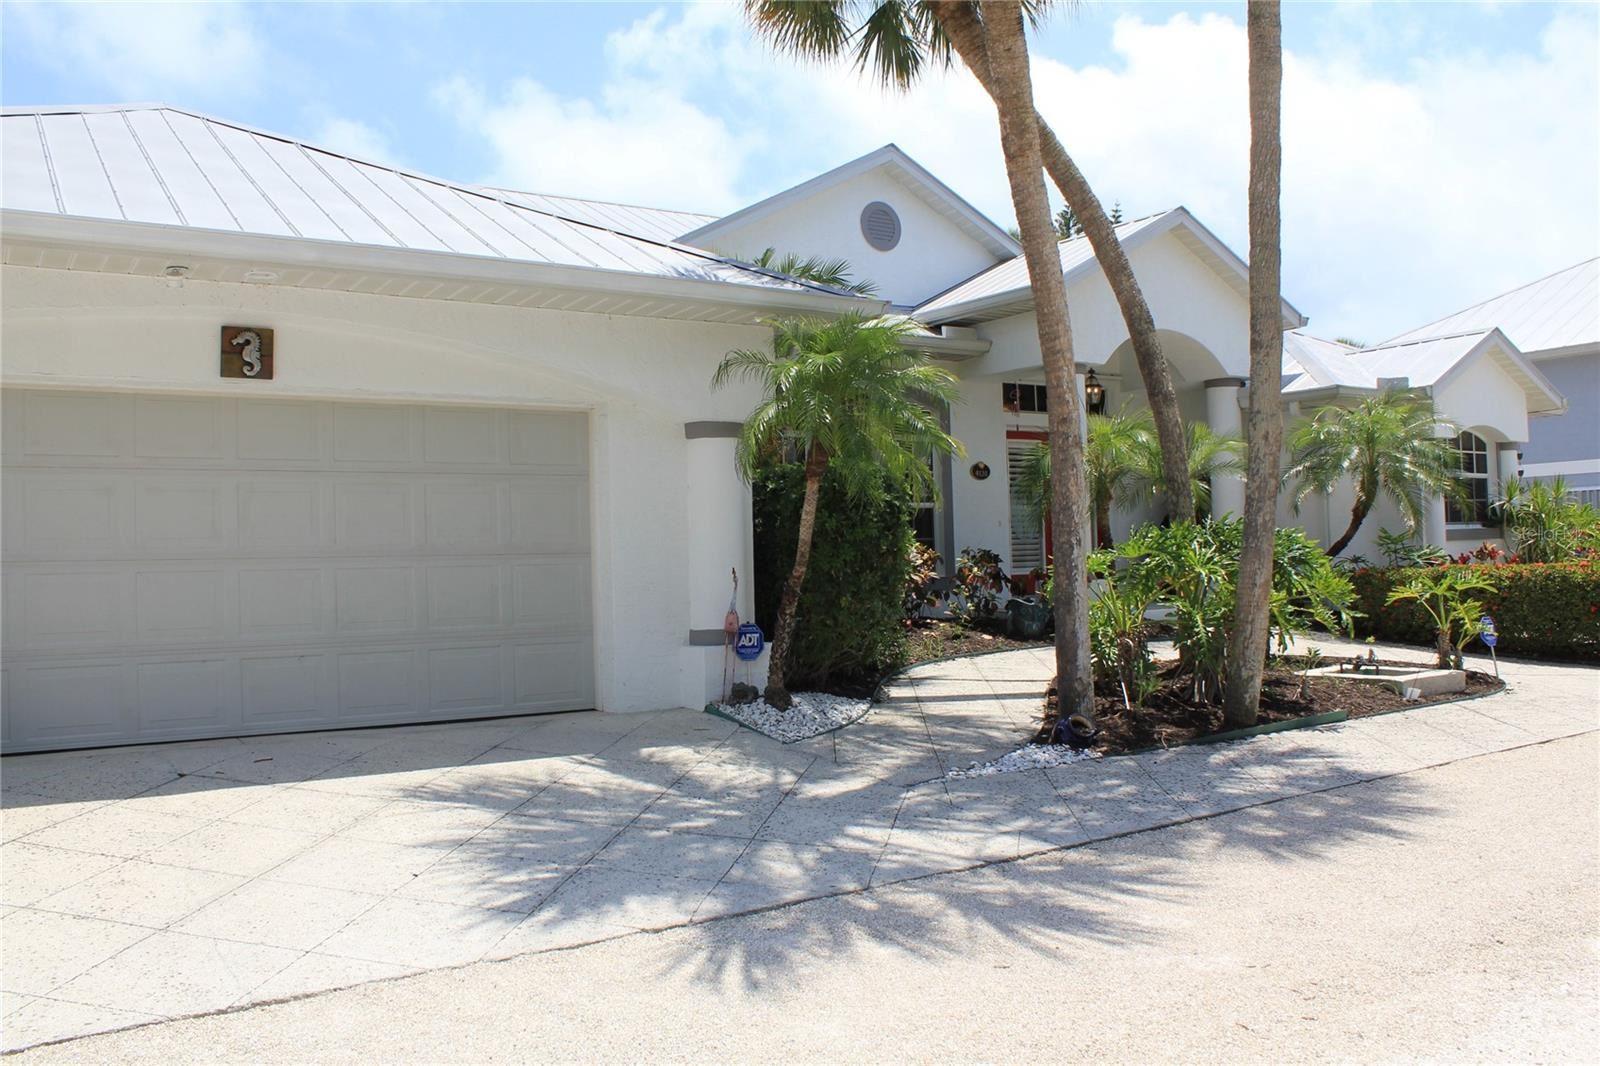 Photo of 4131 N BEACH ROAD, ENGLEWOOD, FL 34223 (MLS # A4504761)